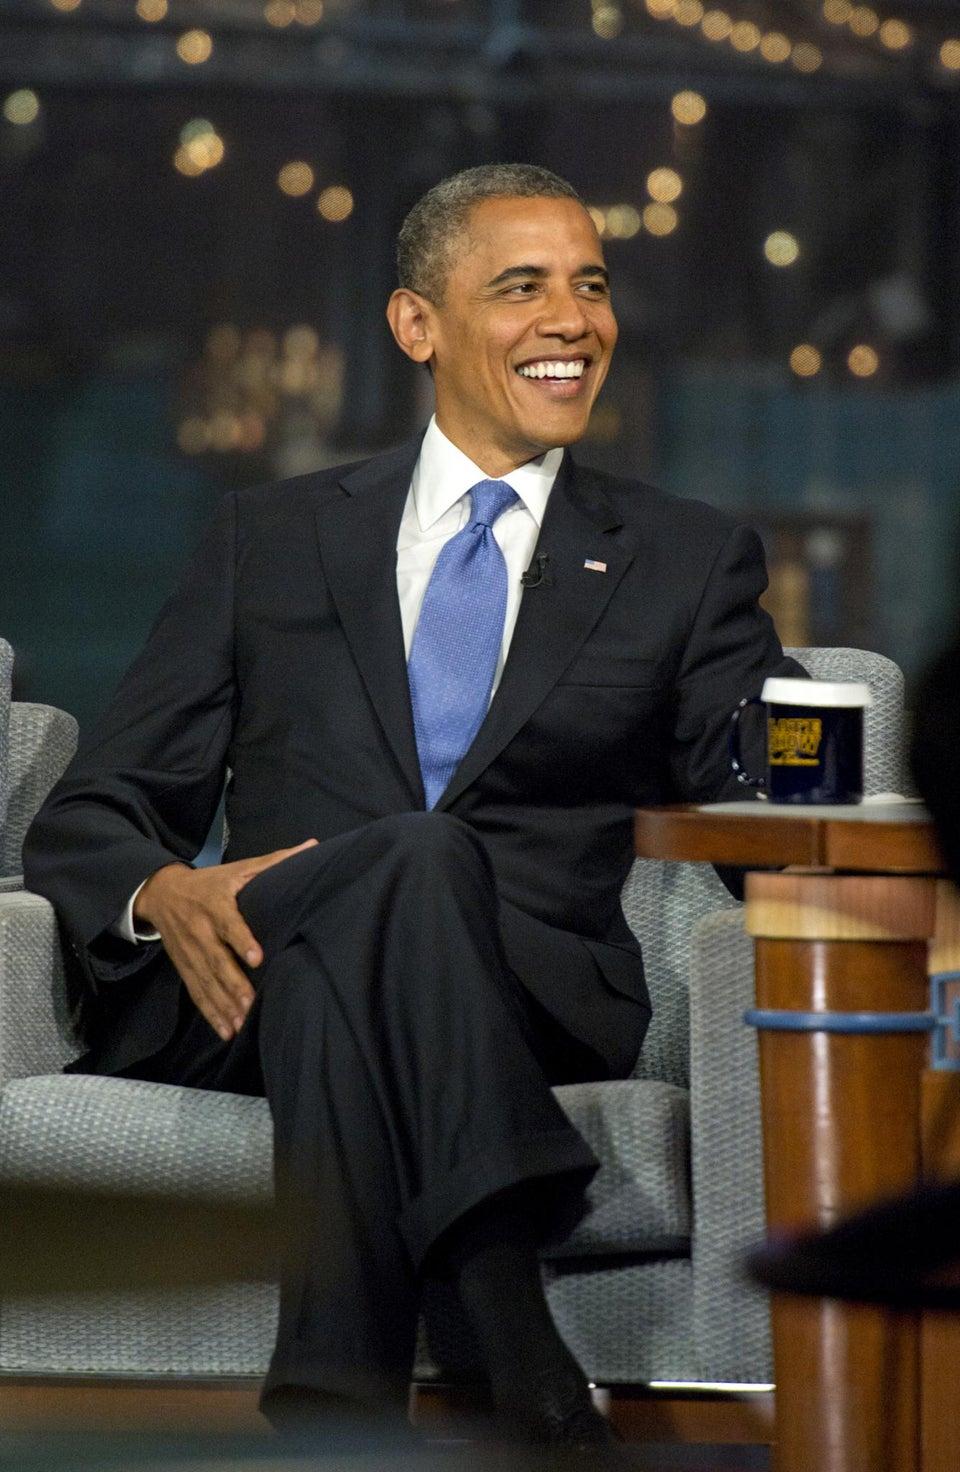 President Obama Pokes Fun at Donald Trump